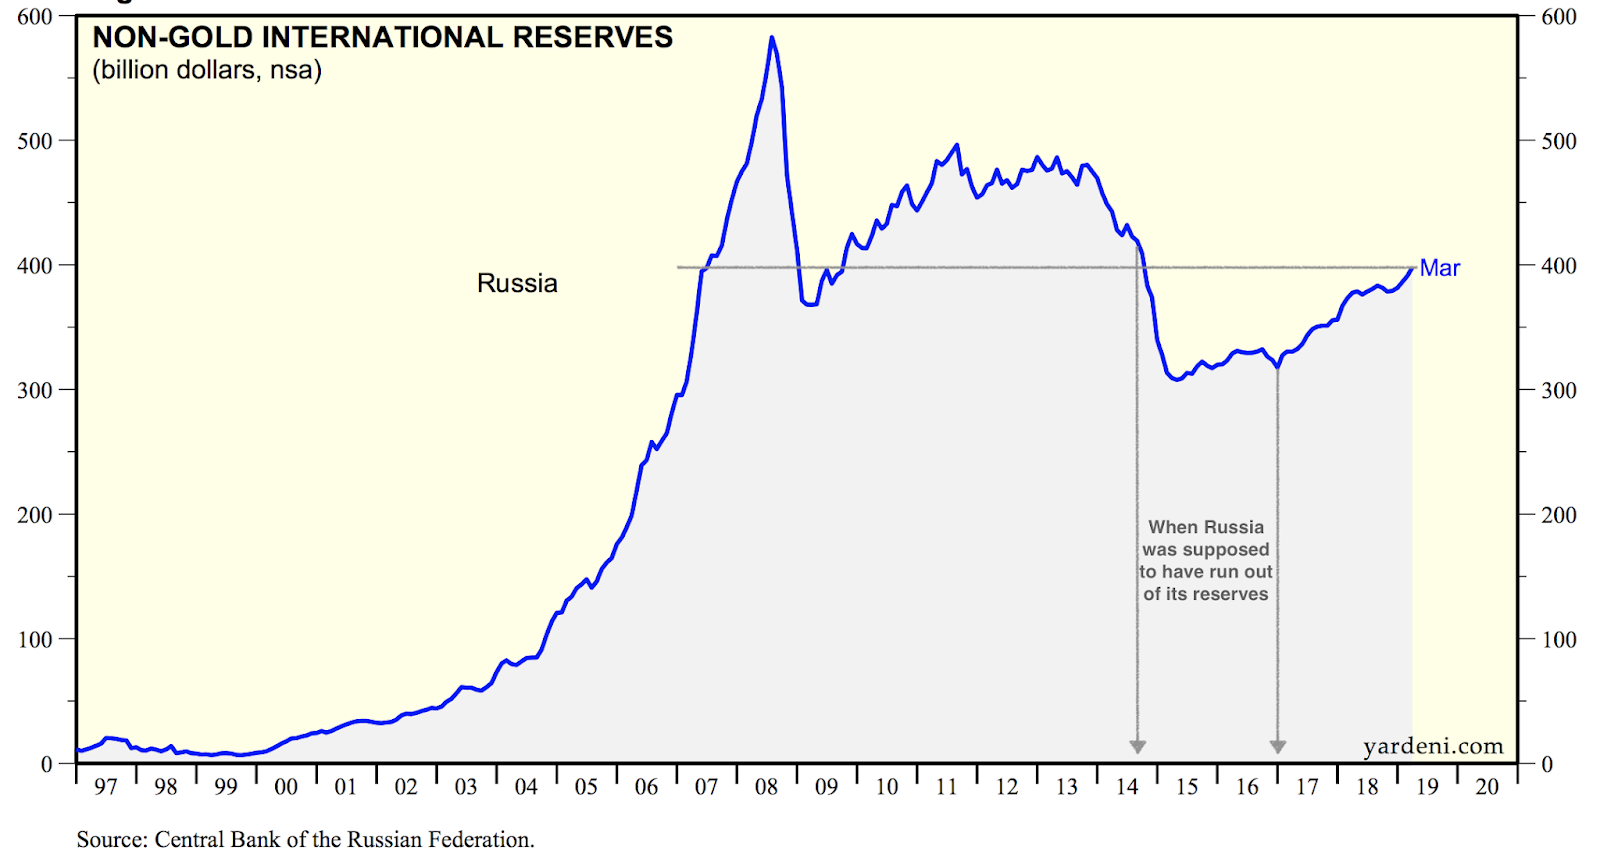 True Economics: 10/4/19: Russian Foreign Exchange Reserves